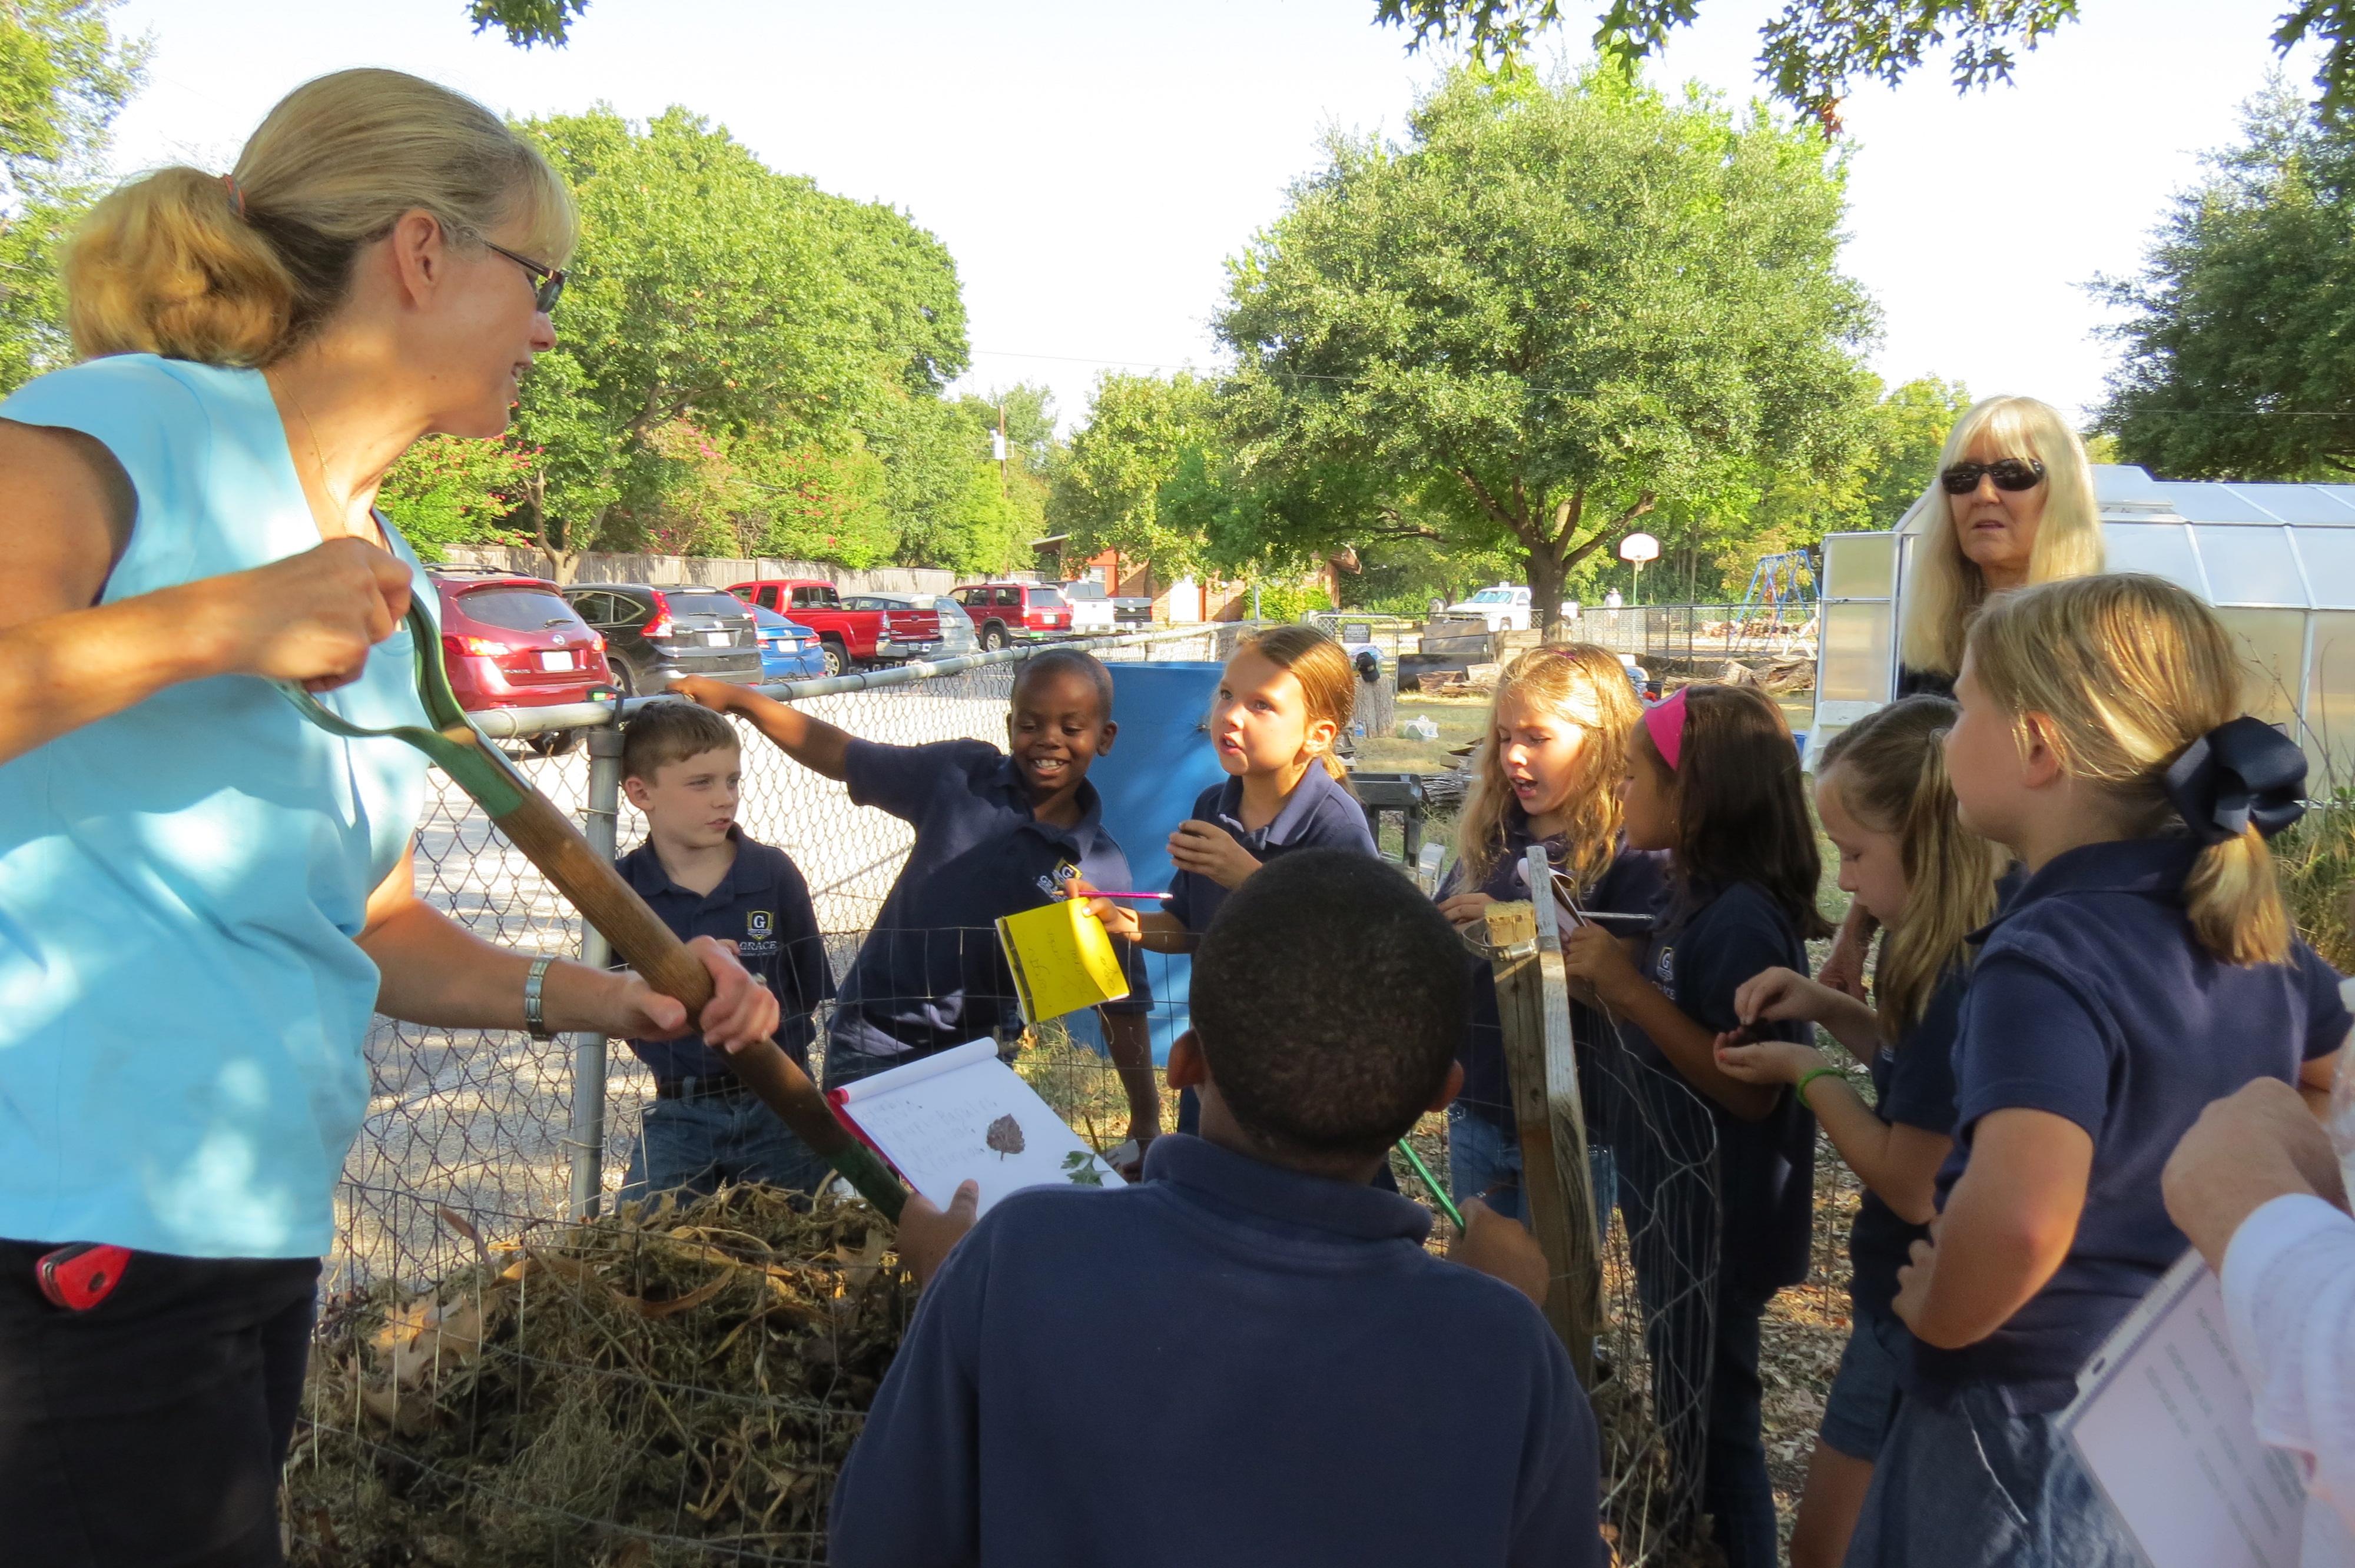 Lisa, a Master at Composting and Teaching!